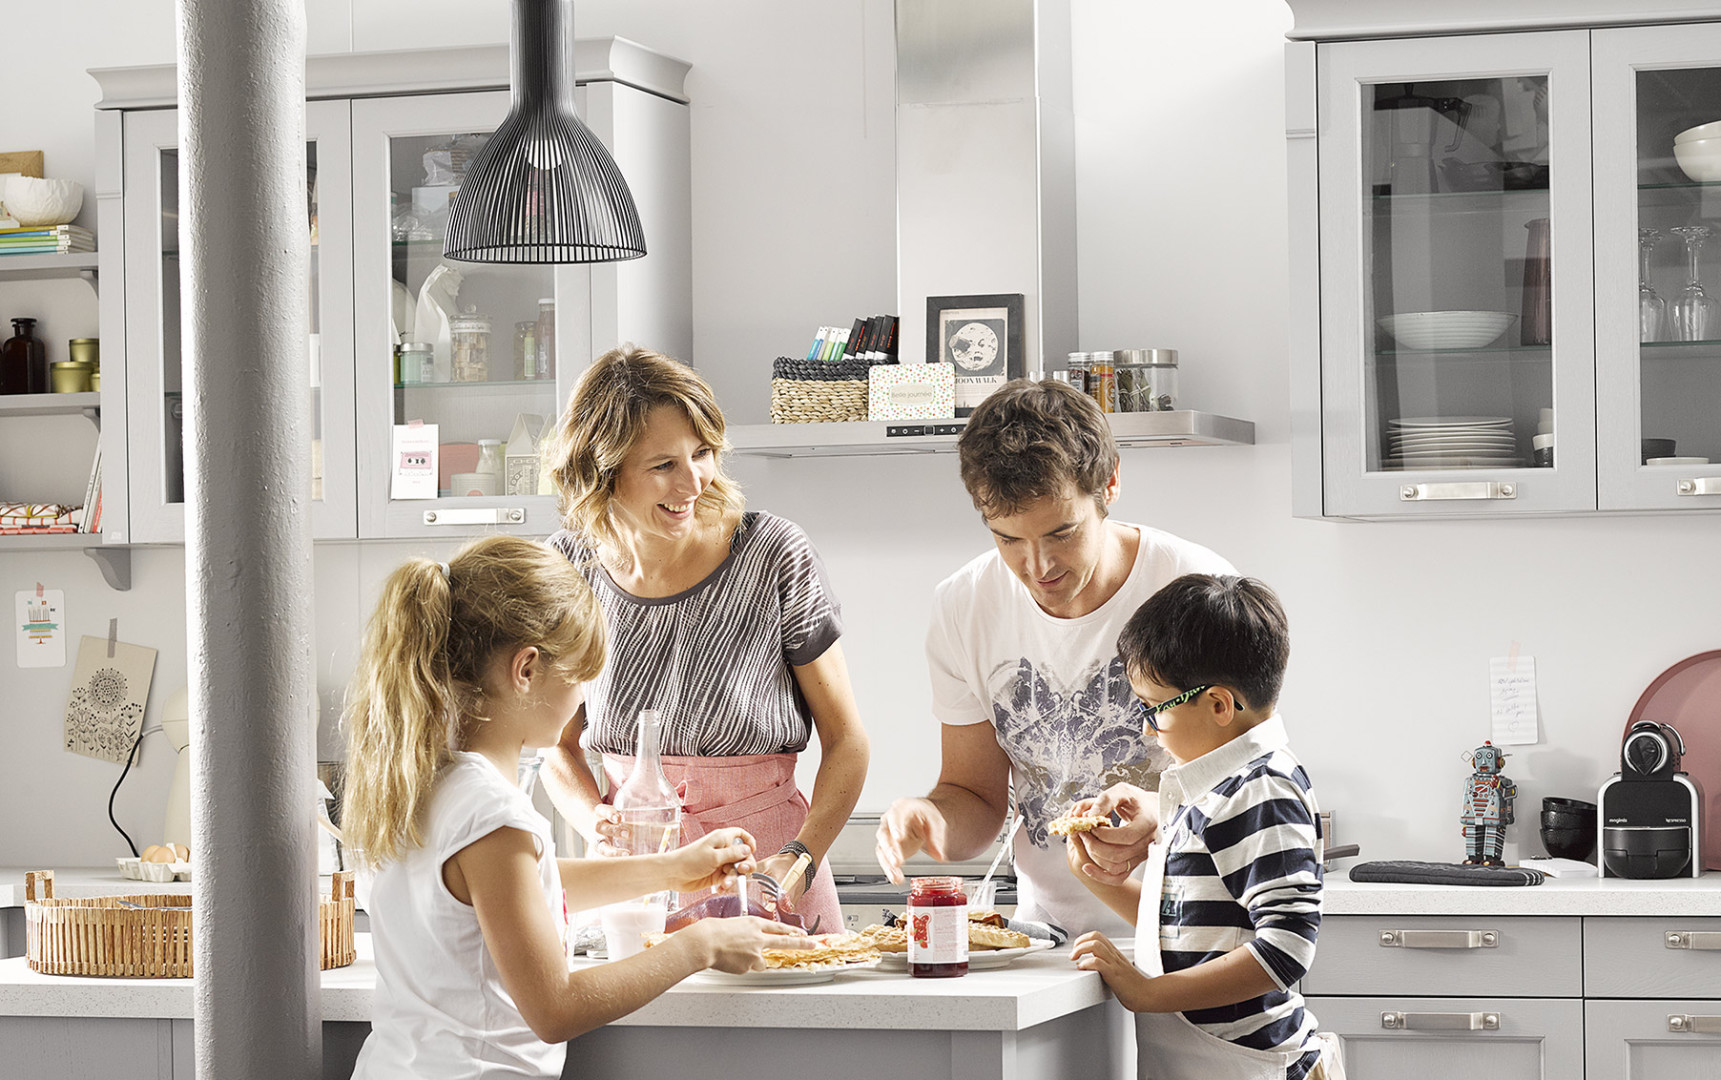 cuisine schmidt recrutement perfect salaire cuisiniste schmidt new stunning cuisine ixina. Black Bedroom Furniture Sets. Home Design Ideas